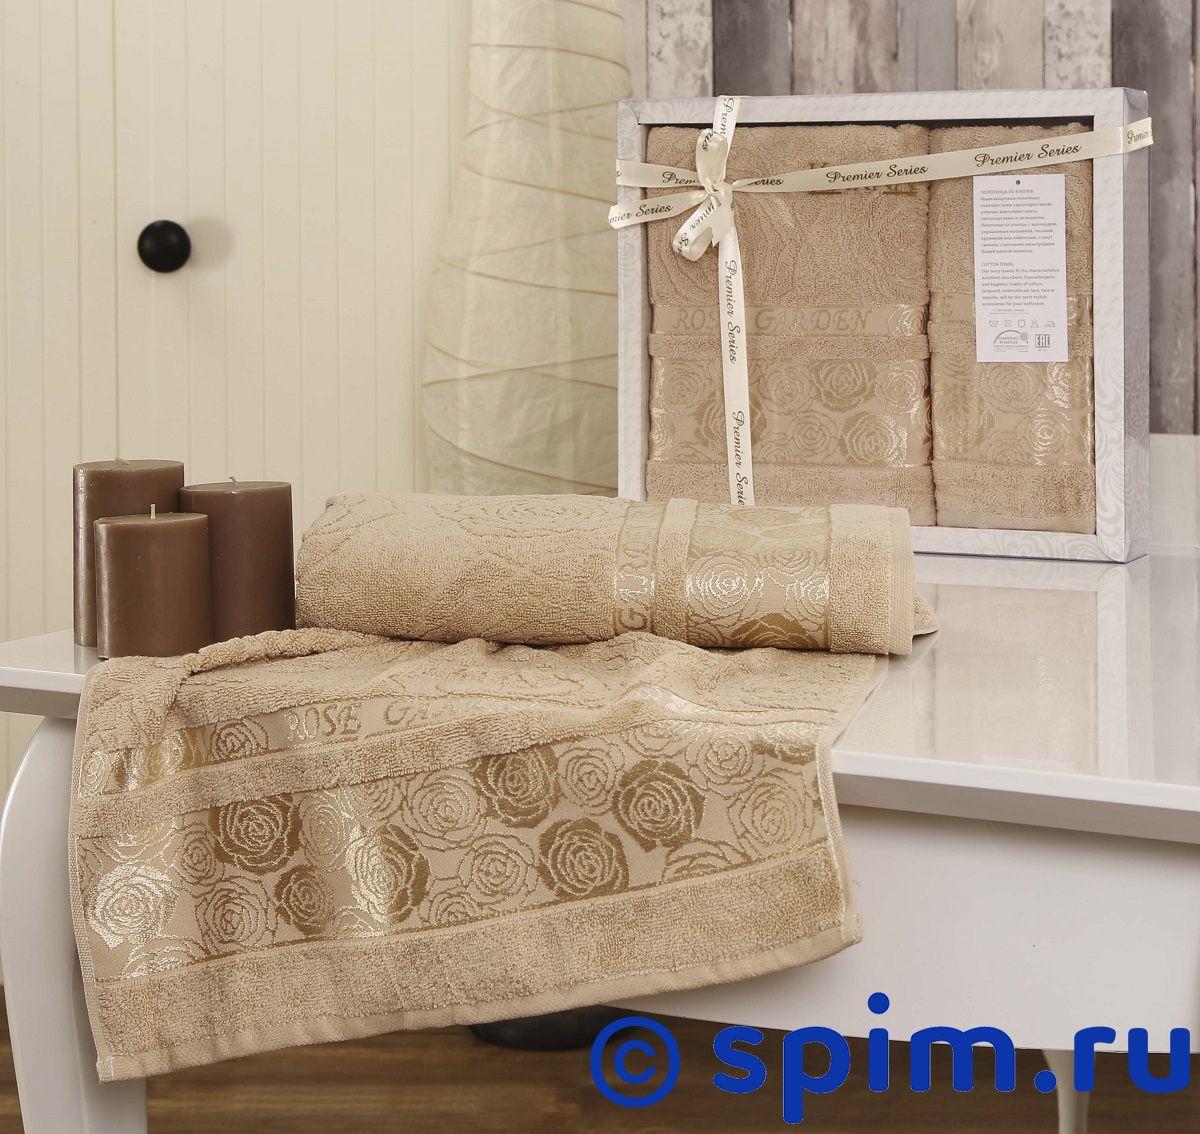 Комплект полотенец Karna Rose Garden, бежевый